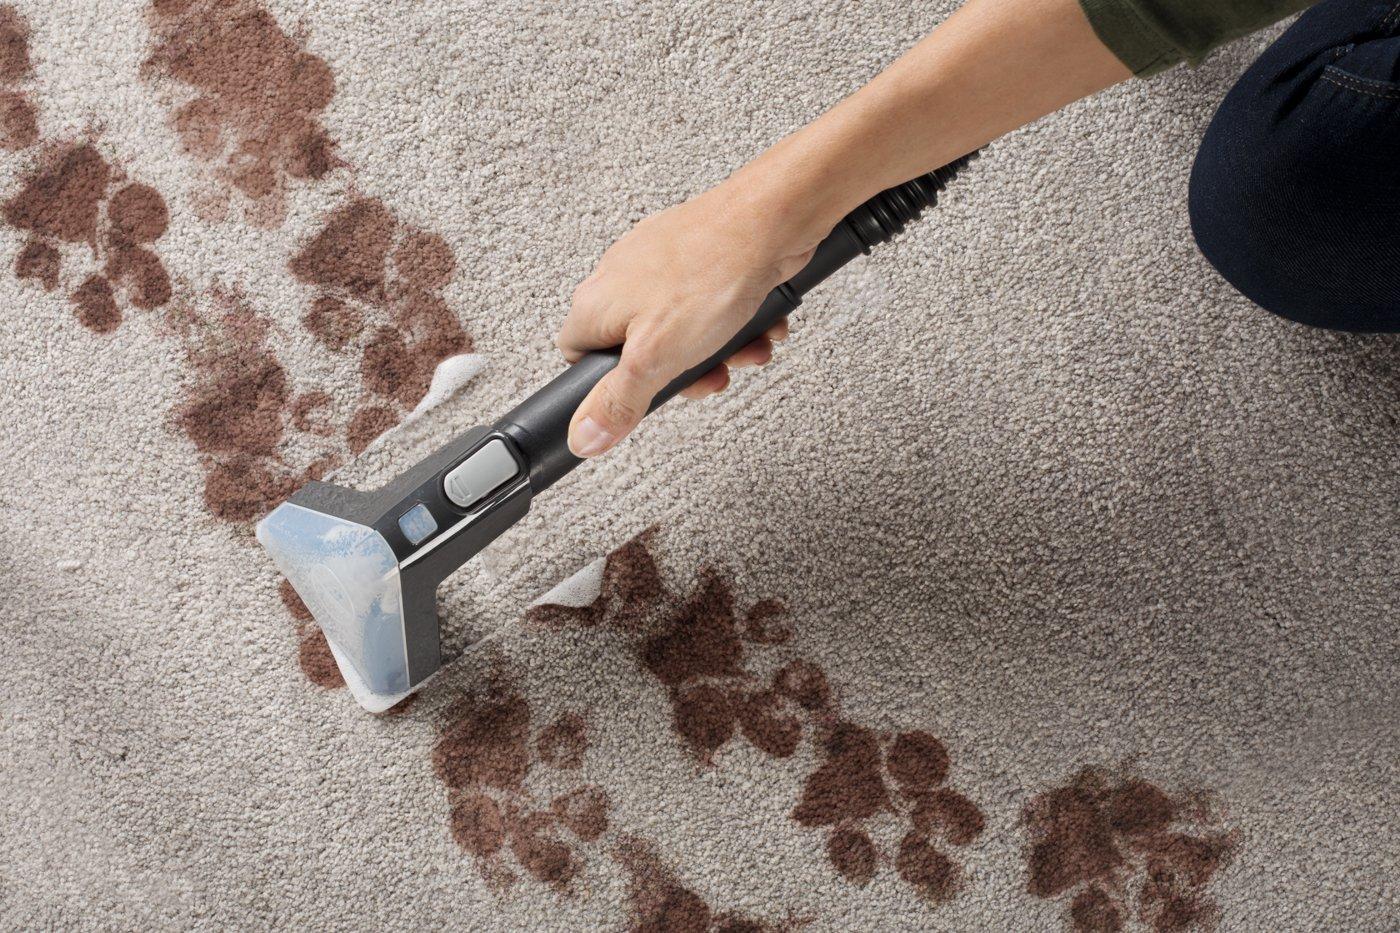 Power Scrub Elite Pet Carpet Cleaner6